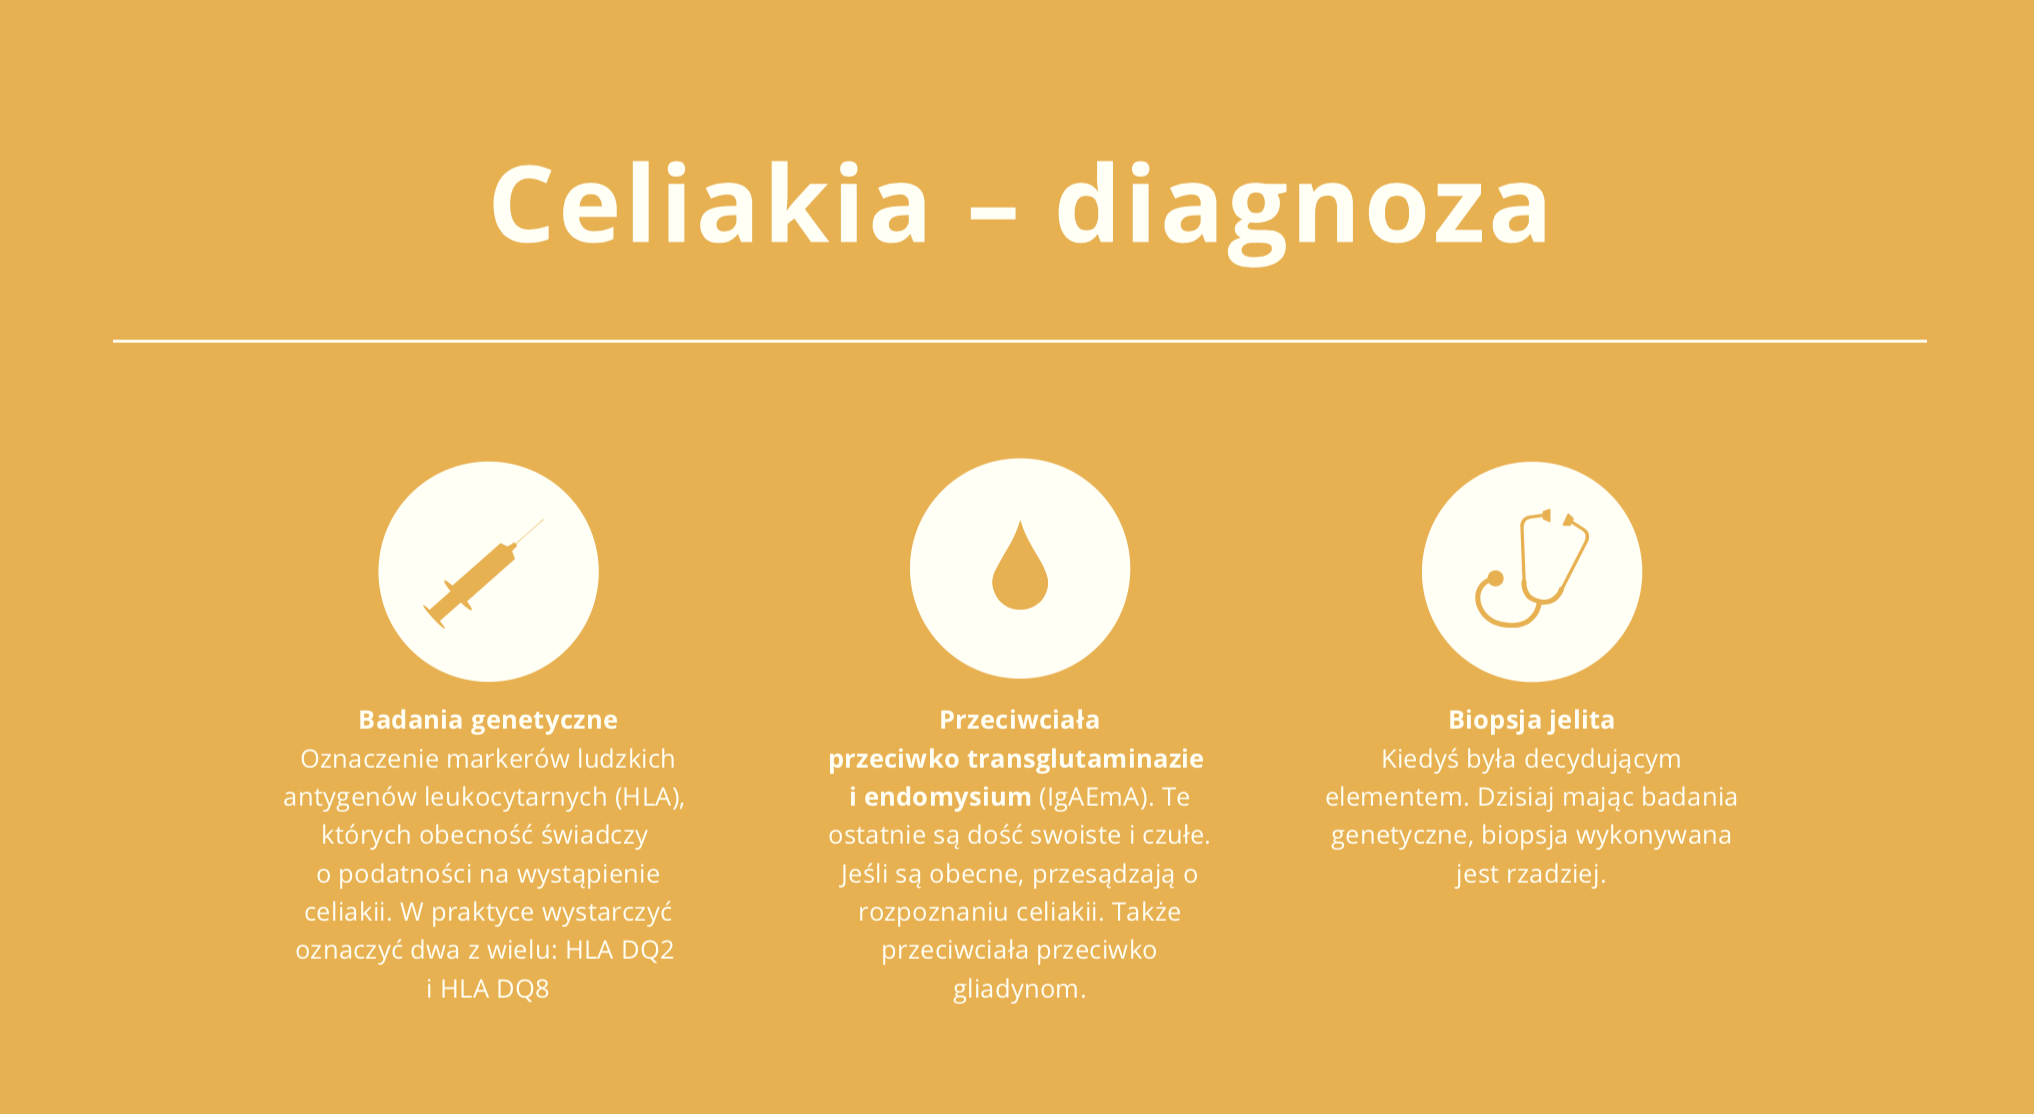 hipoalergiczni-dr-danuta-mylek-pszenica-15